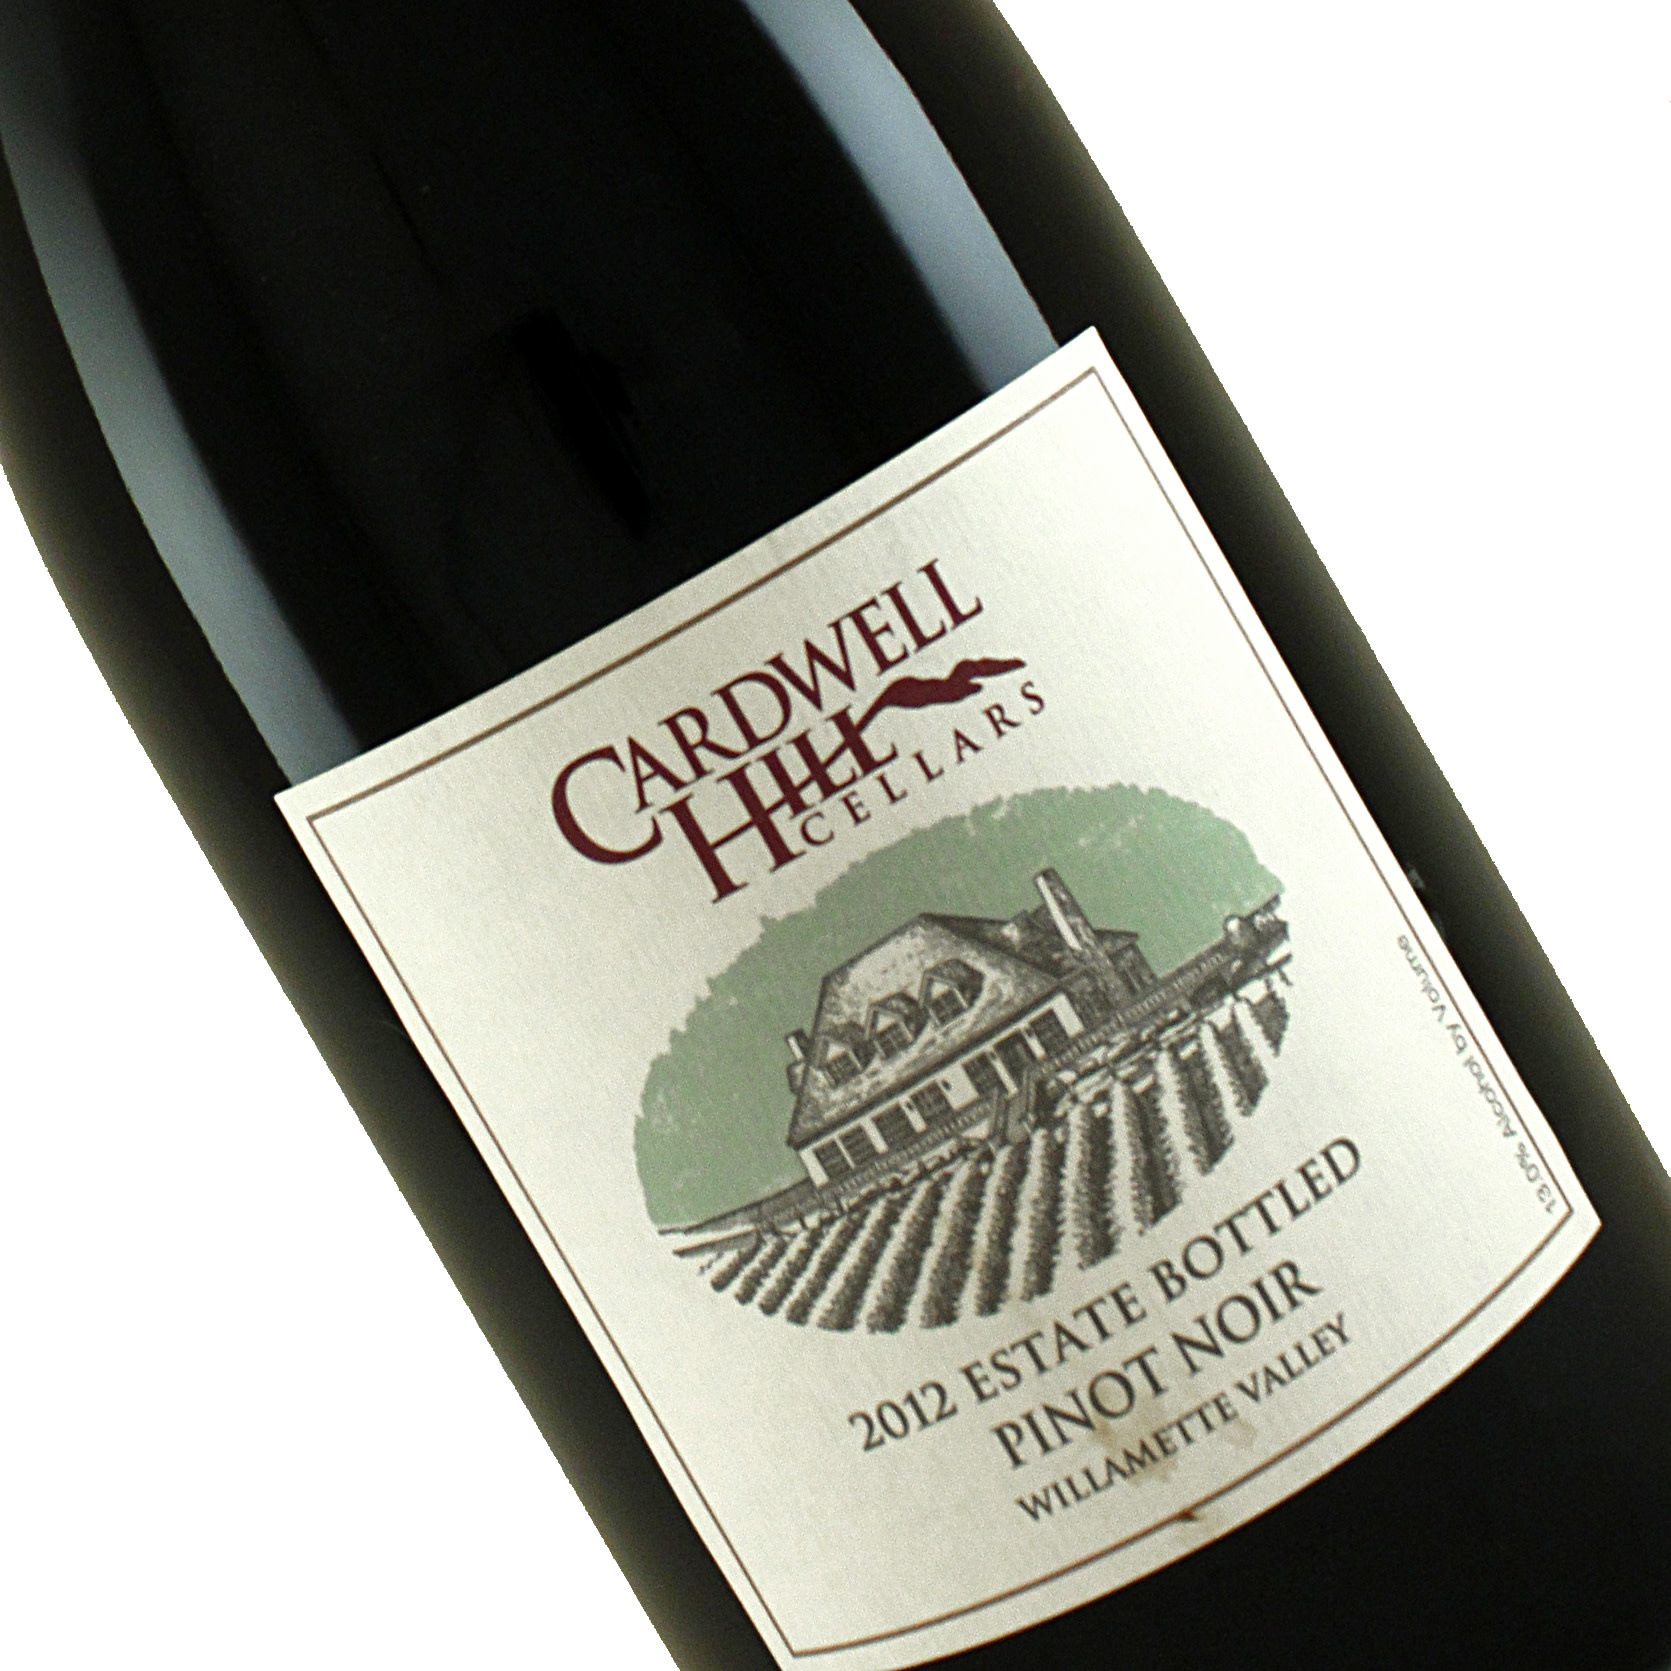 Cardwell Hill 2012 Estate Pinot Noir Willamette Valley, Oregon-MAGNUM